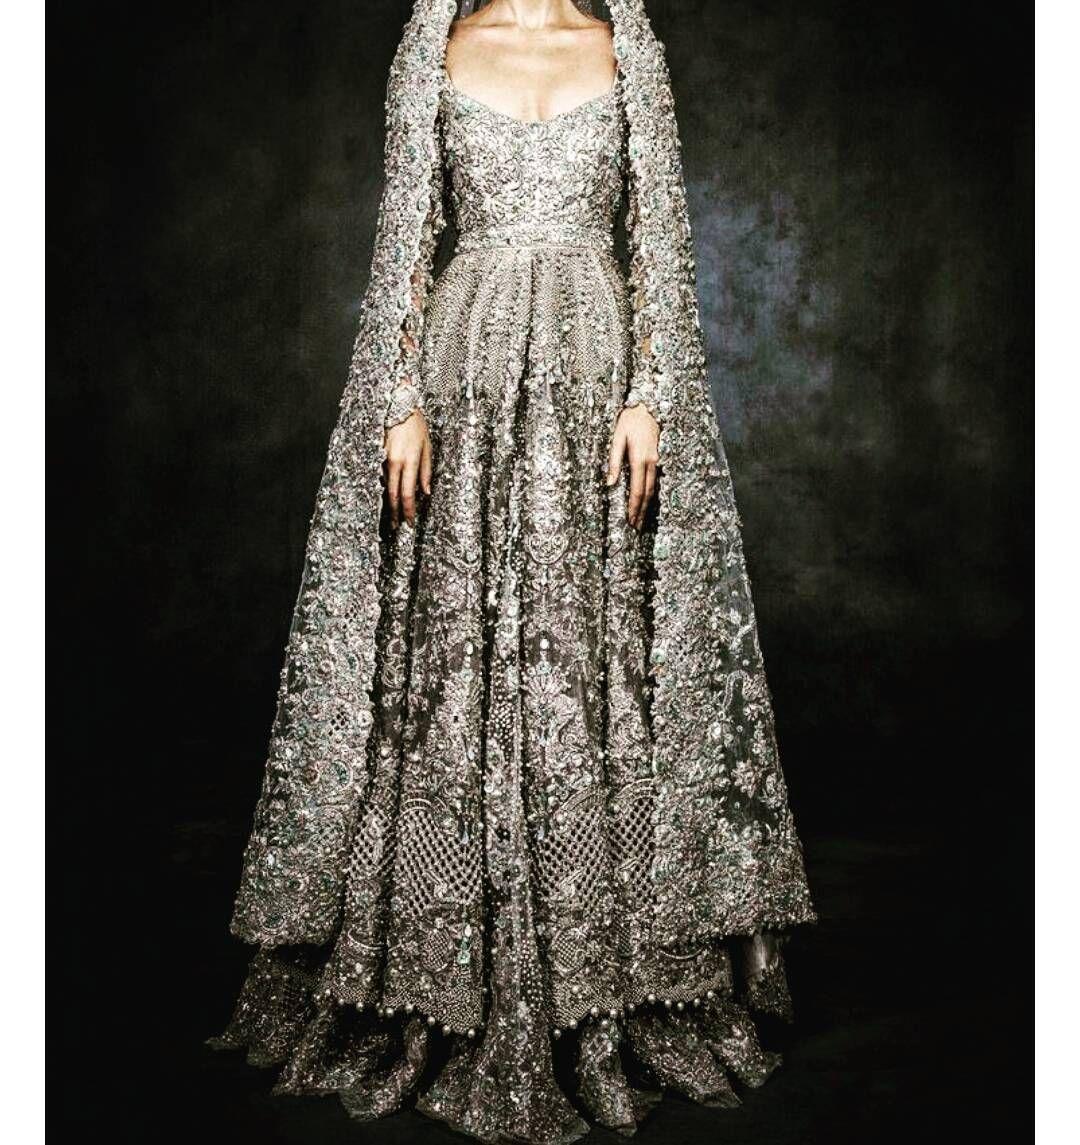 Pin by anna mueller on wedding dresses pinterest girls eyes